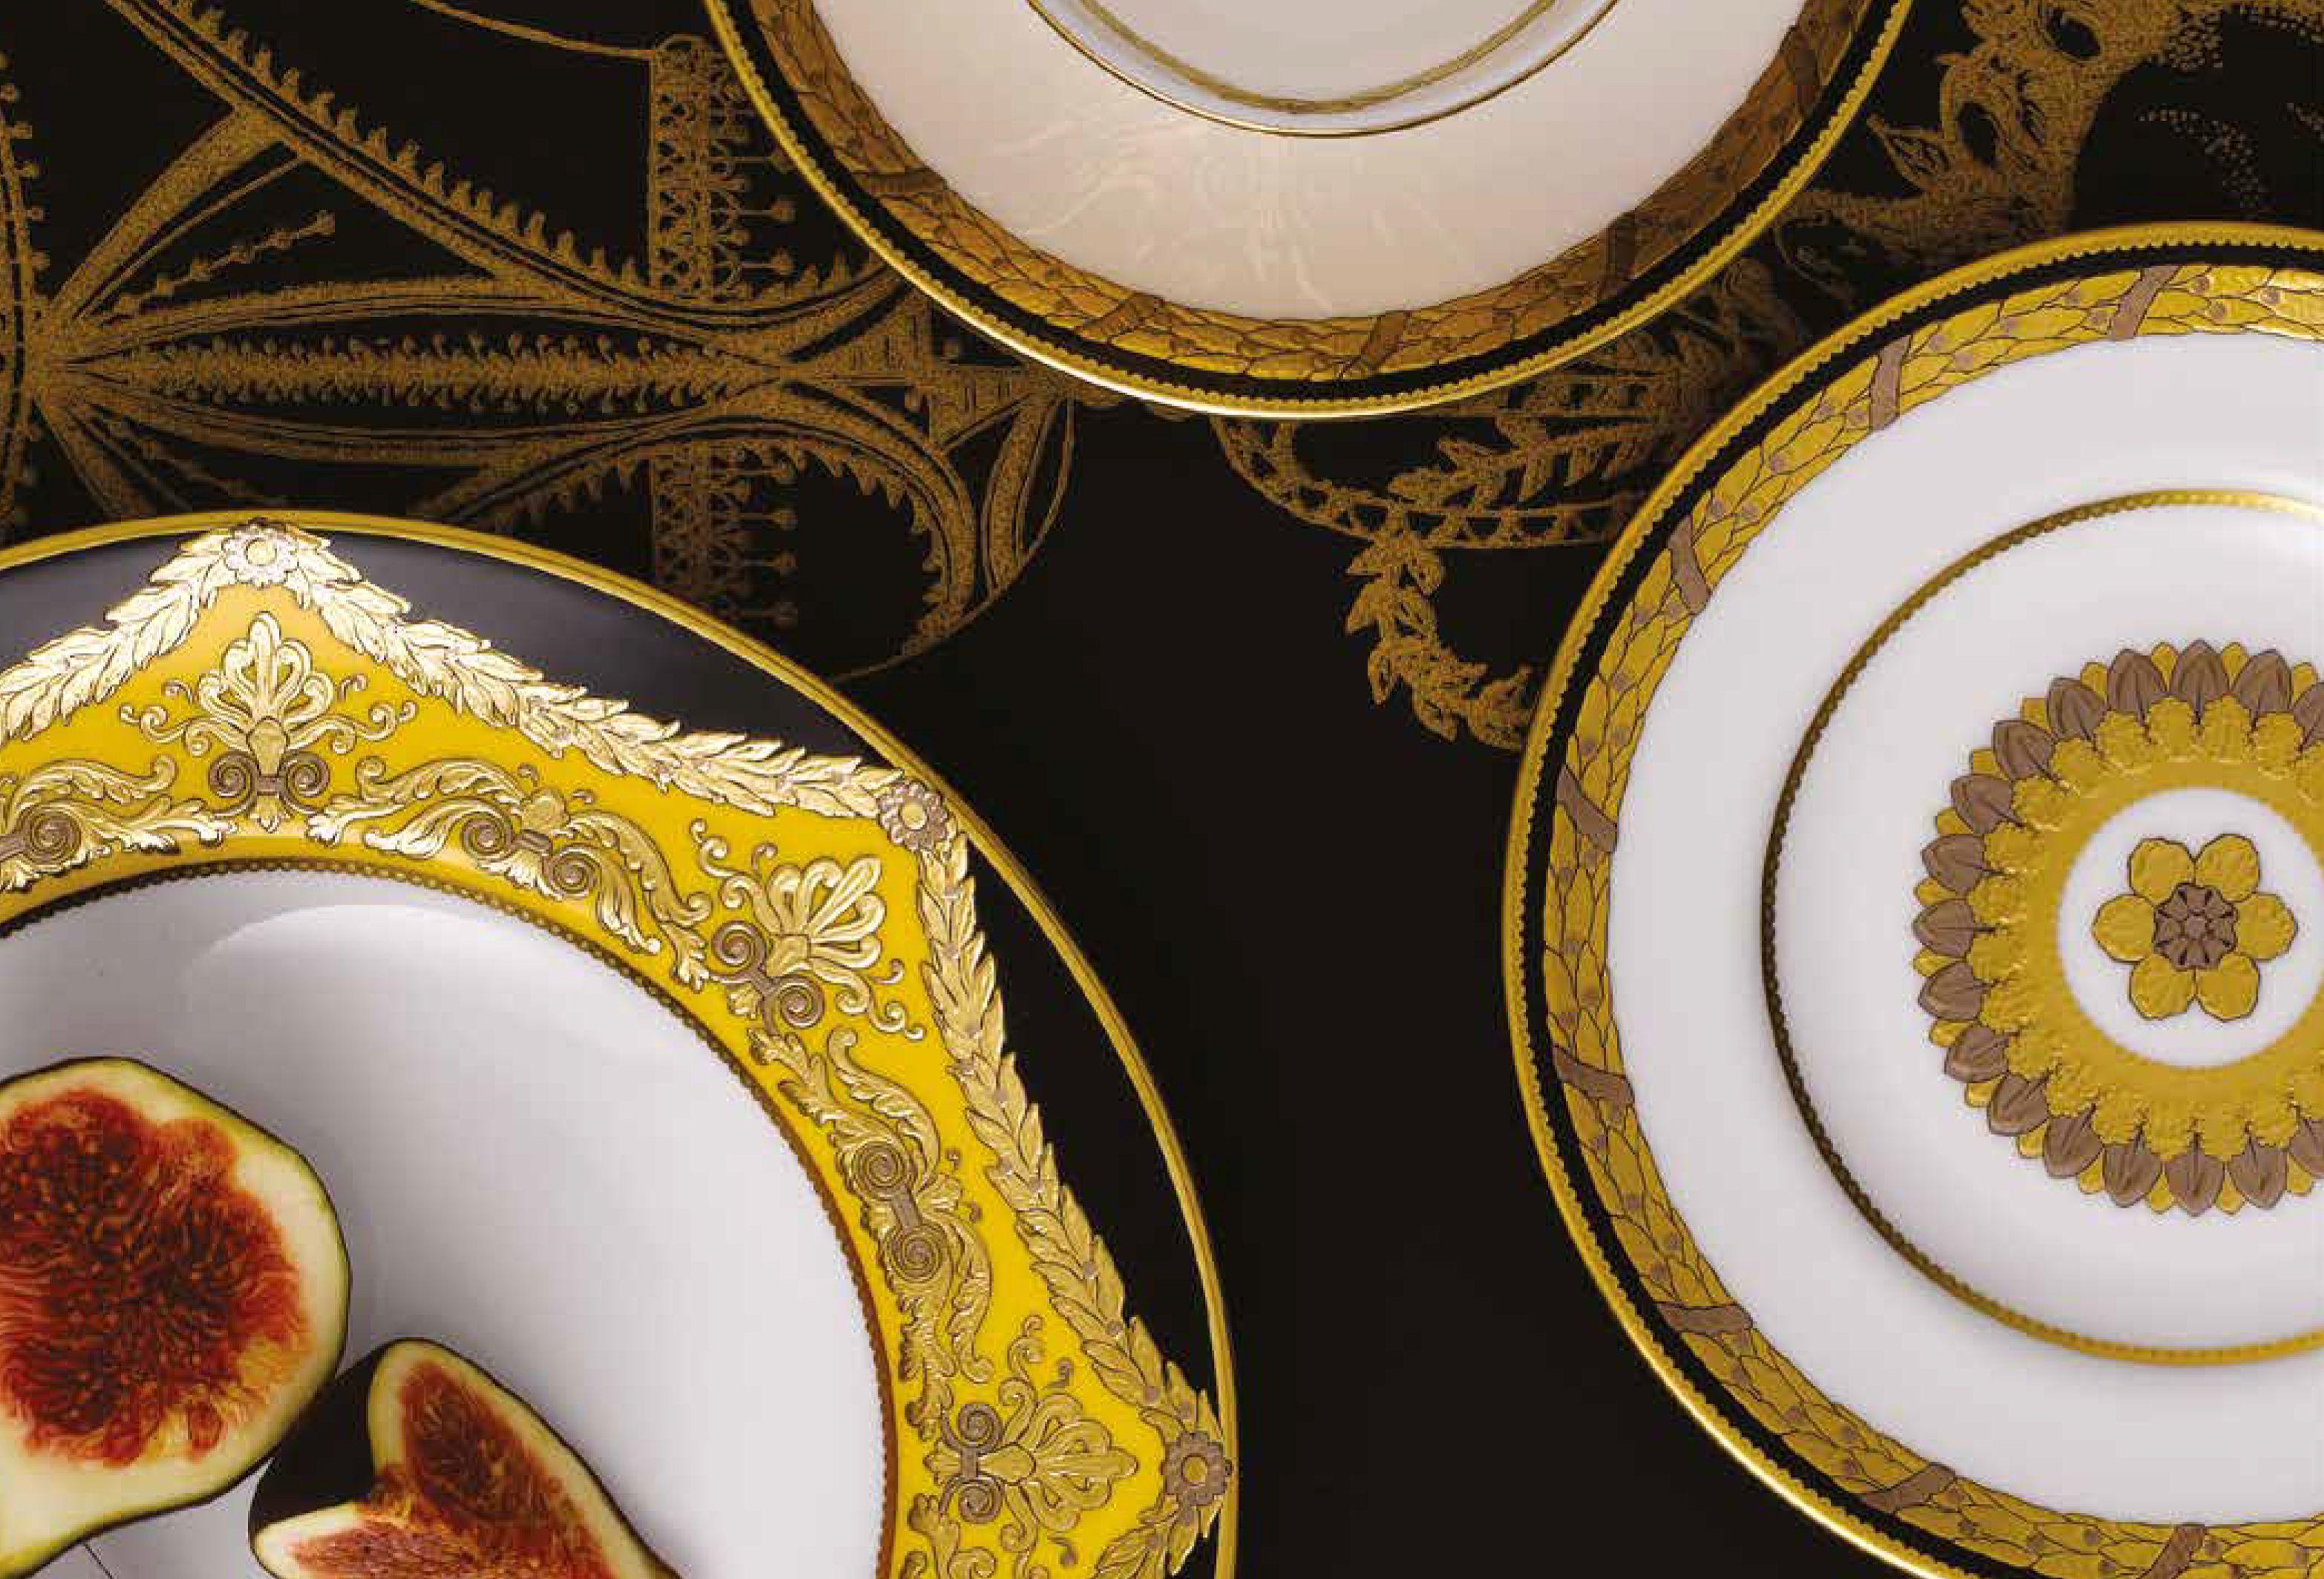 Stunning Royal Crown Derby tableware & Stunning Royal Crown Derby tableware   Royal Crown Derby Collection ...